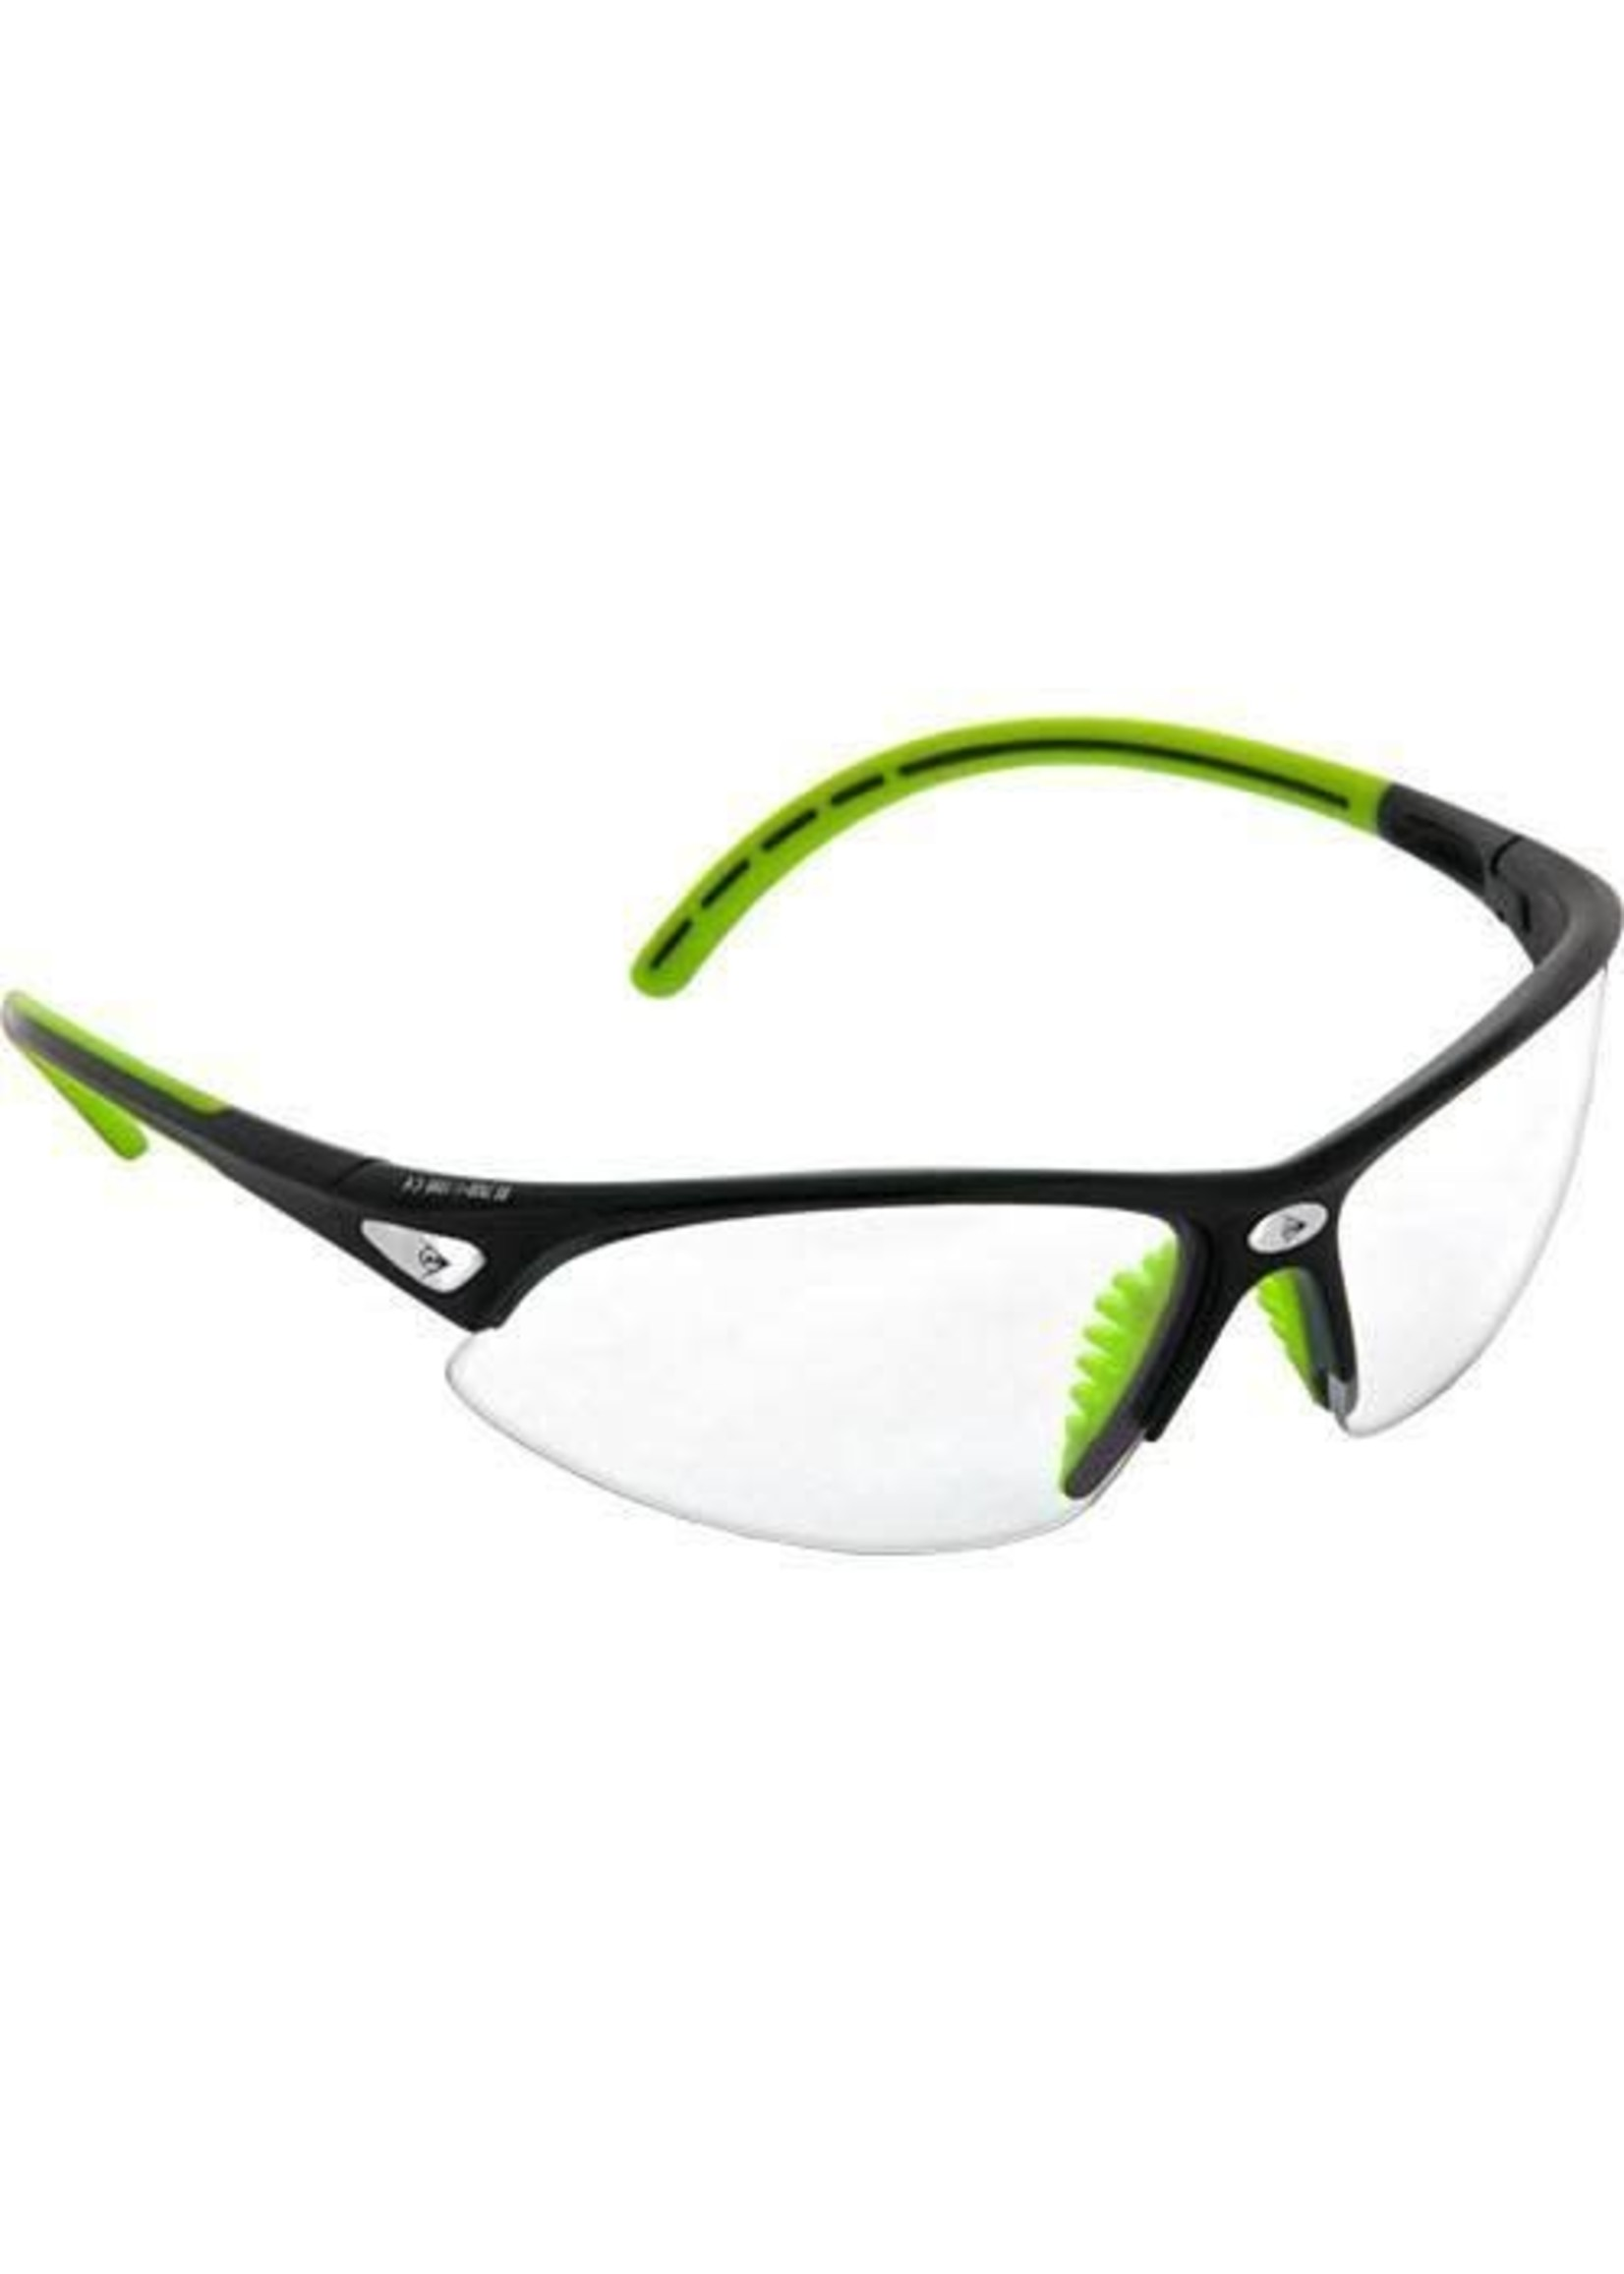 Dunlop Dunlop I-Armor Squash Goggles